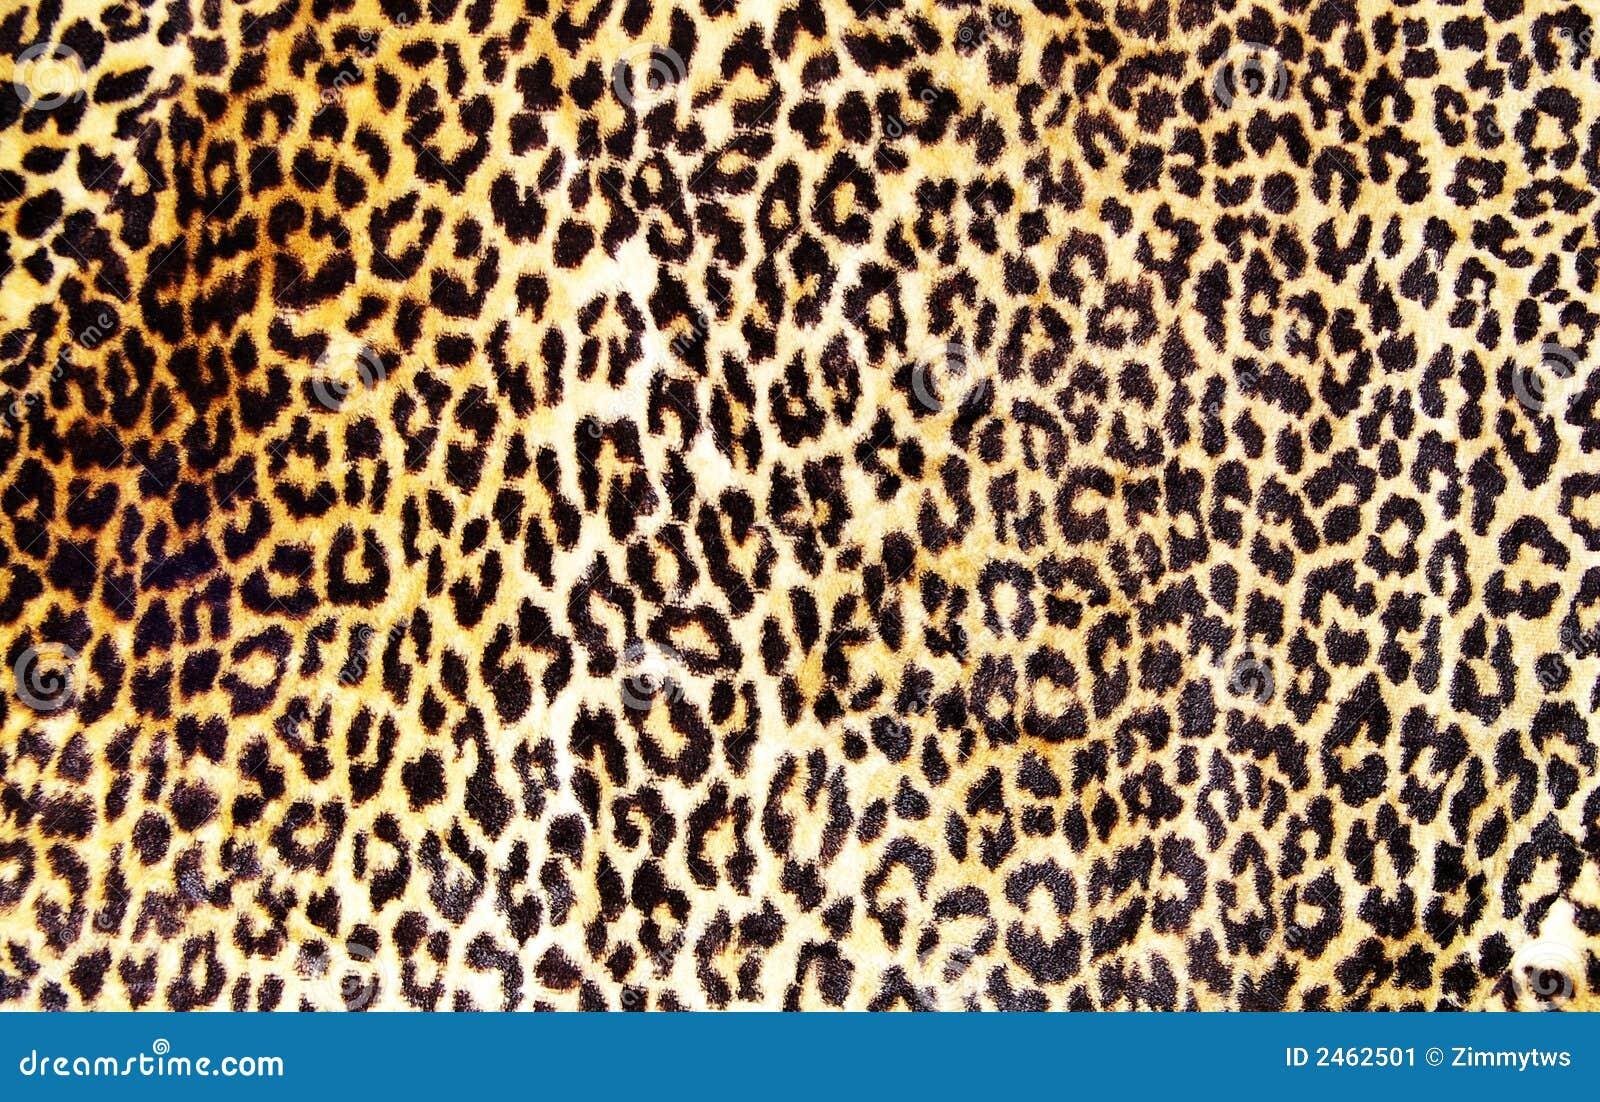 leopard print stock image image of leopard  soft  furry leopard print vector art leopard print victoria's secret pink tank top